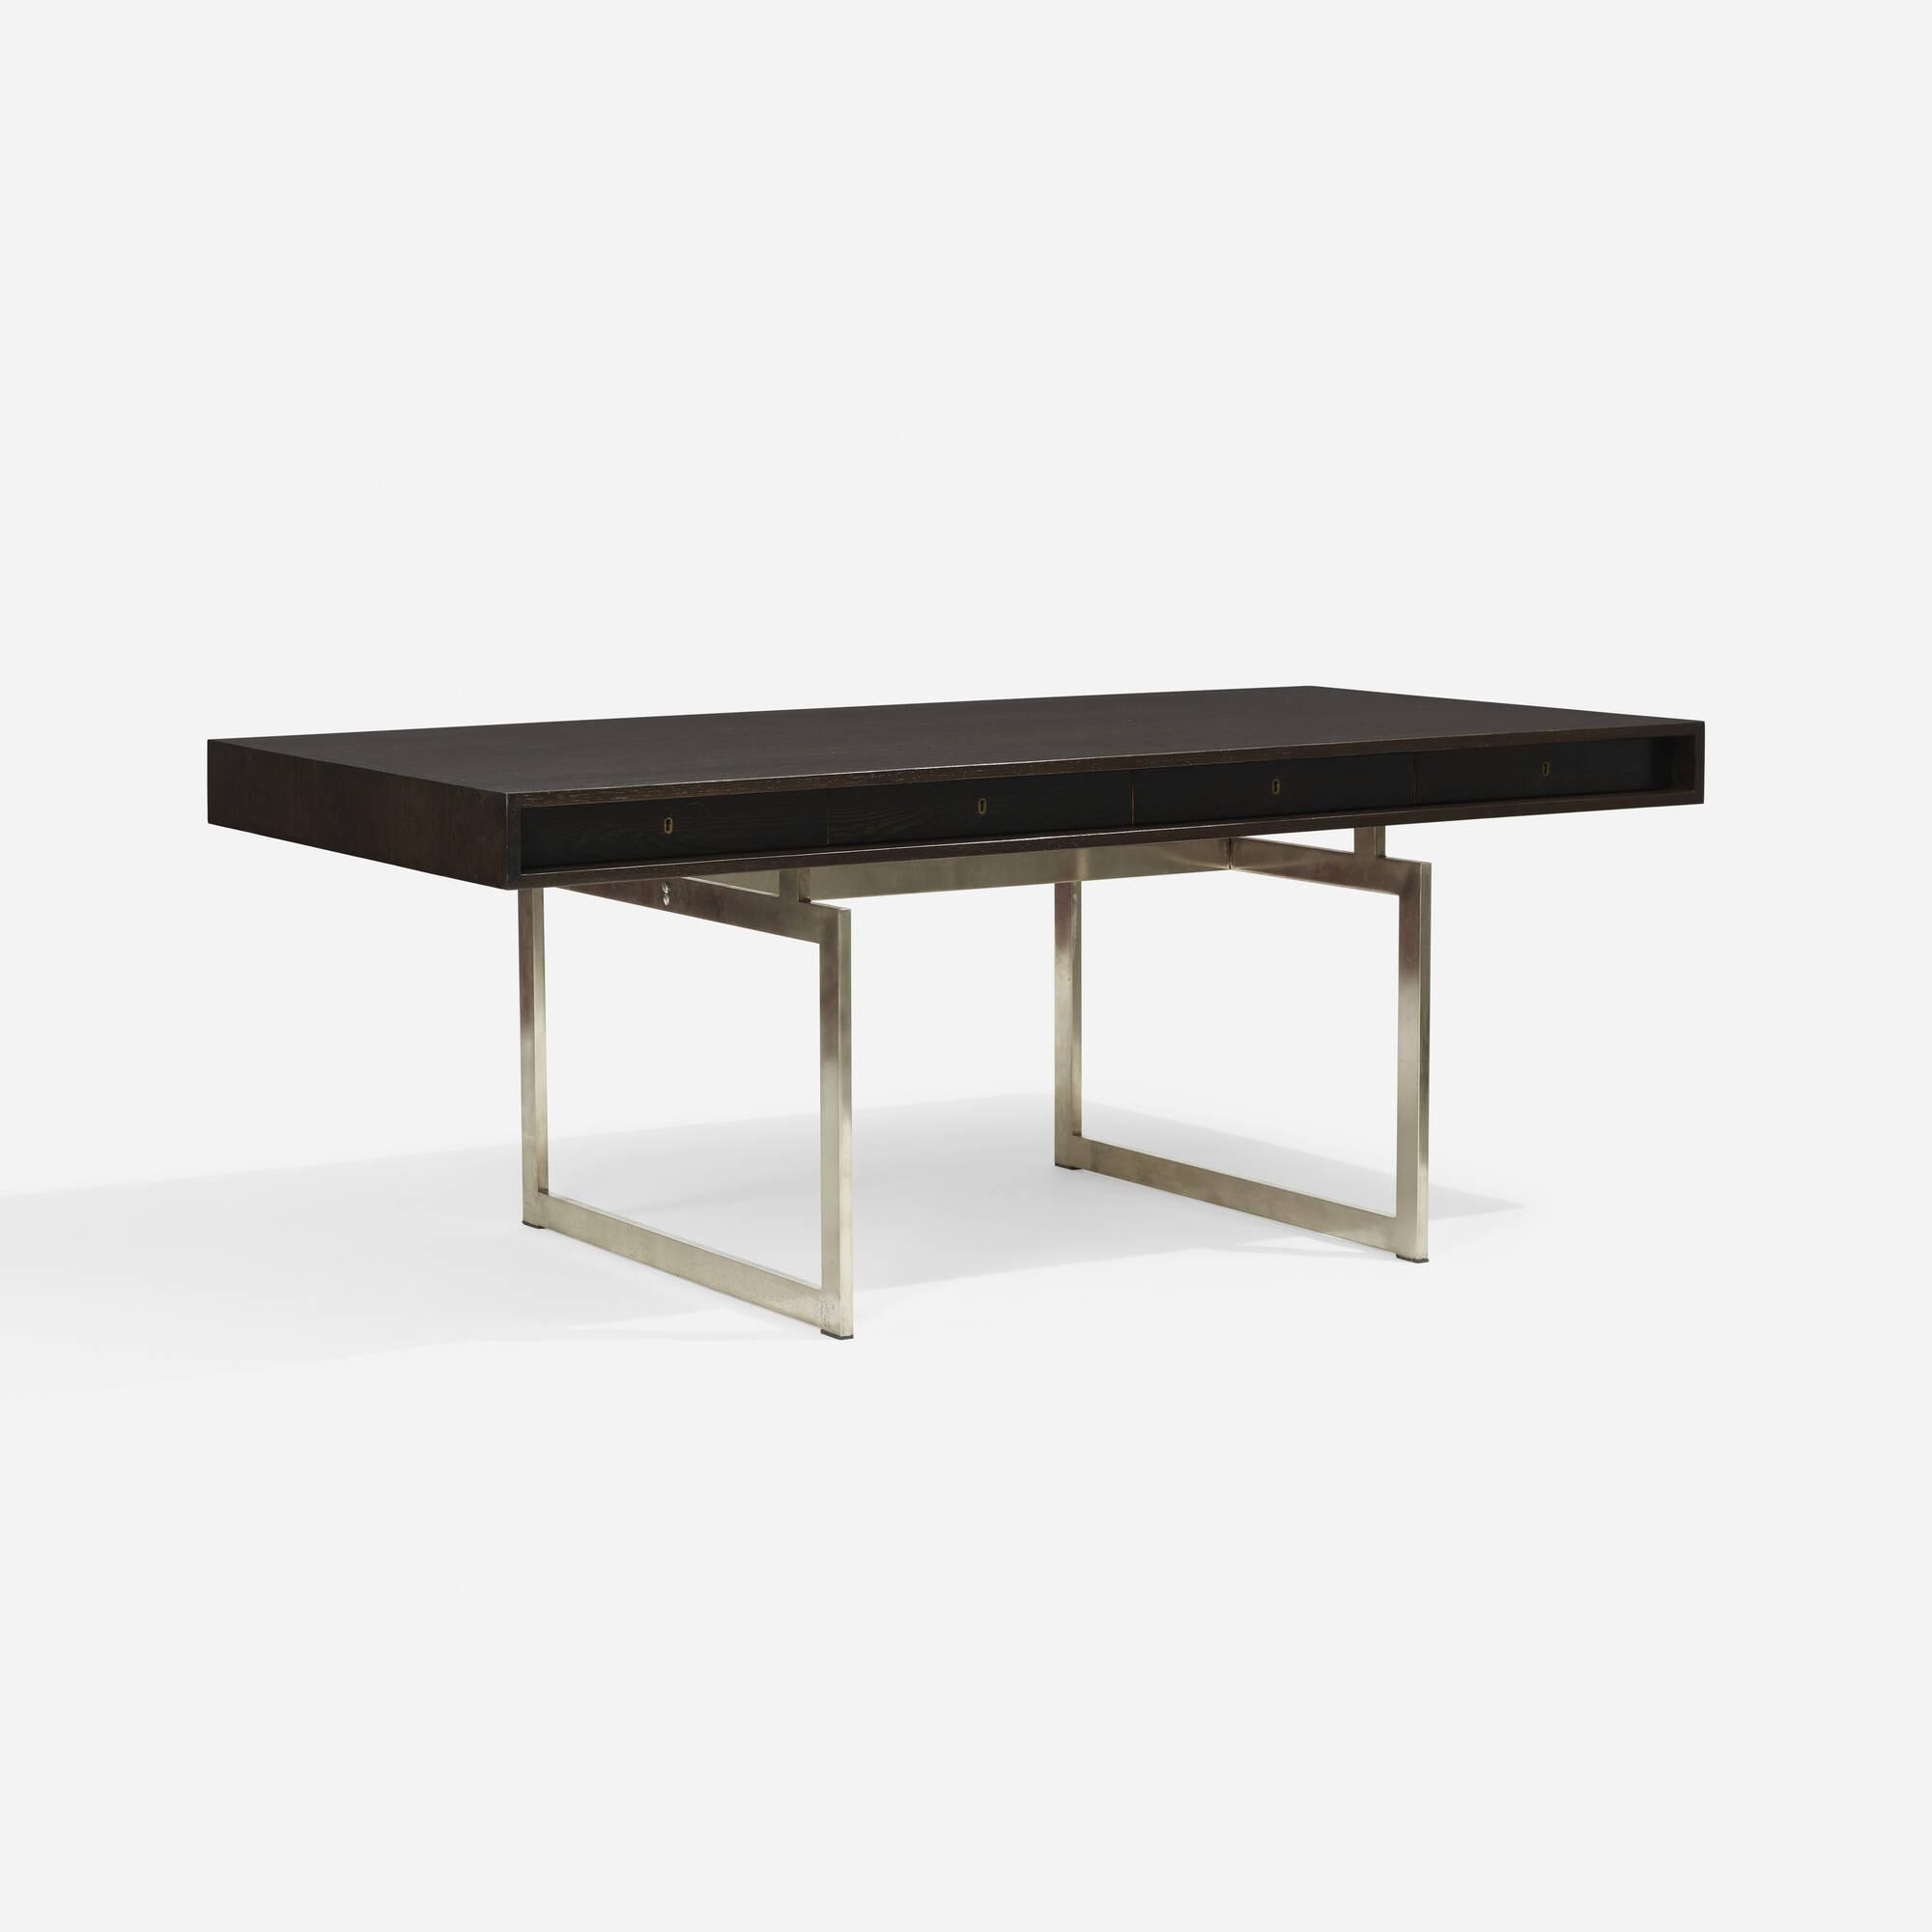 341: Bodil Kjaer / desk (1 of 3)